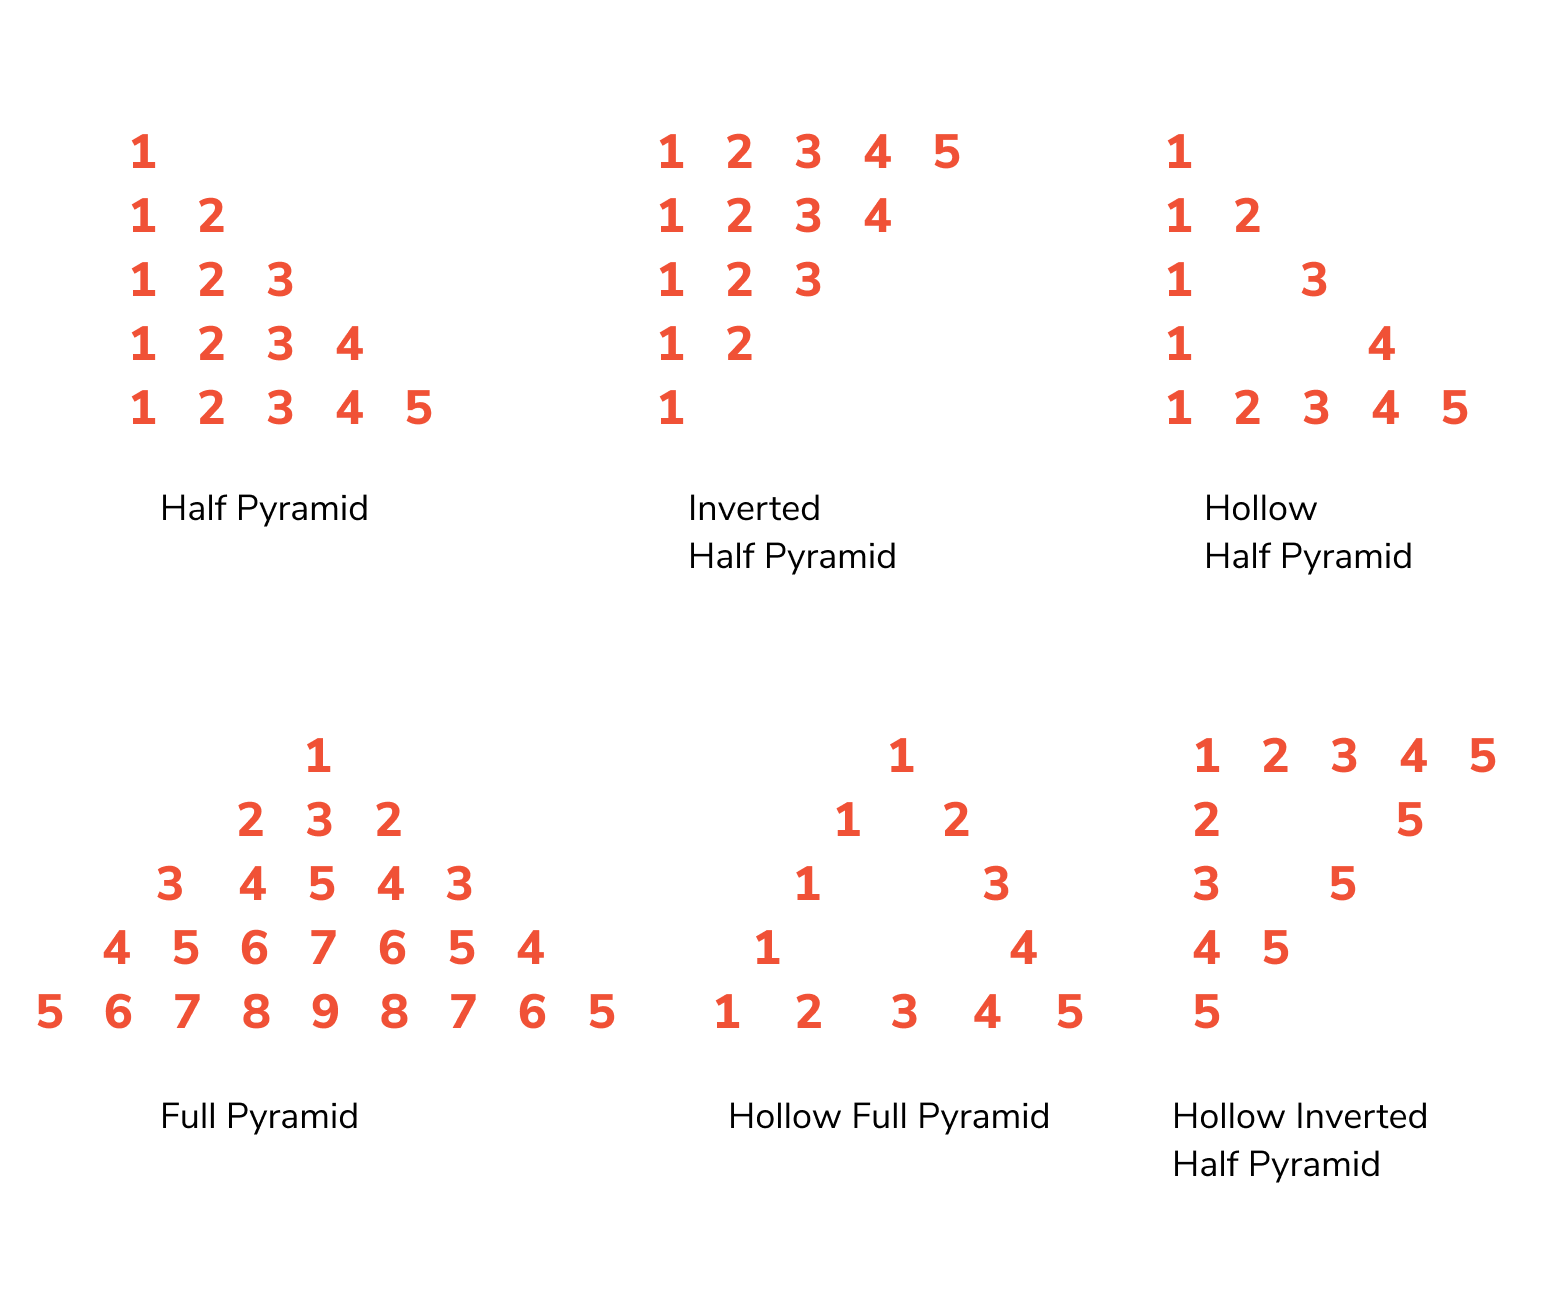 pyramid pattern printing programs in c, c++, java